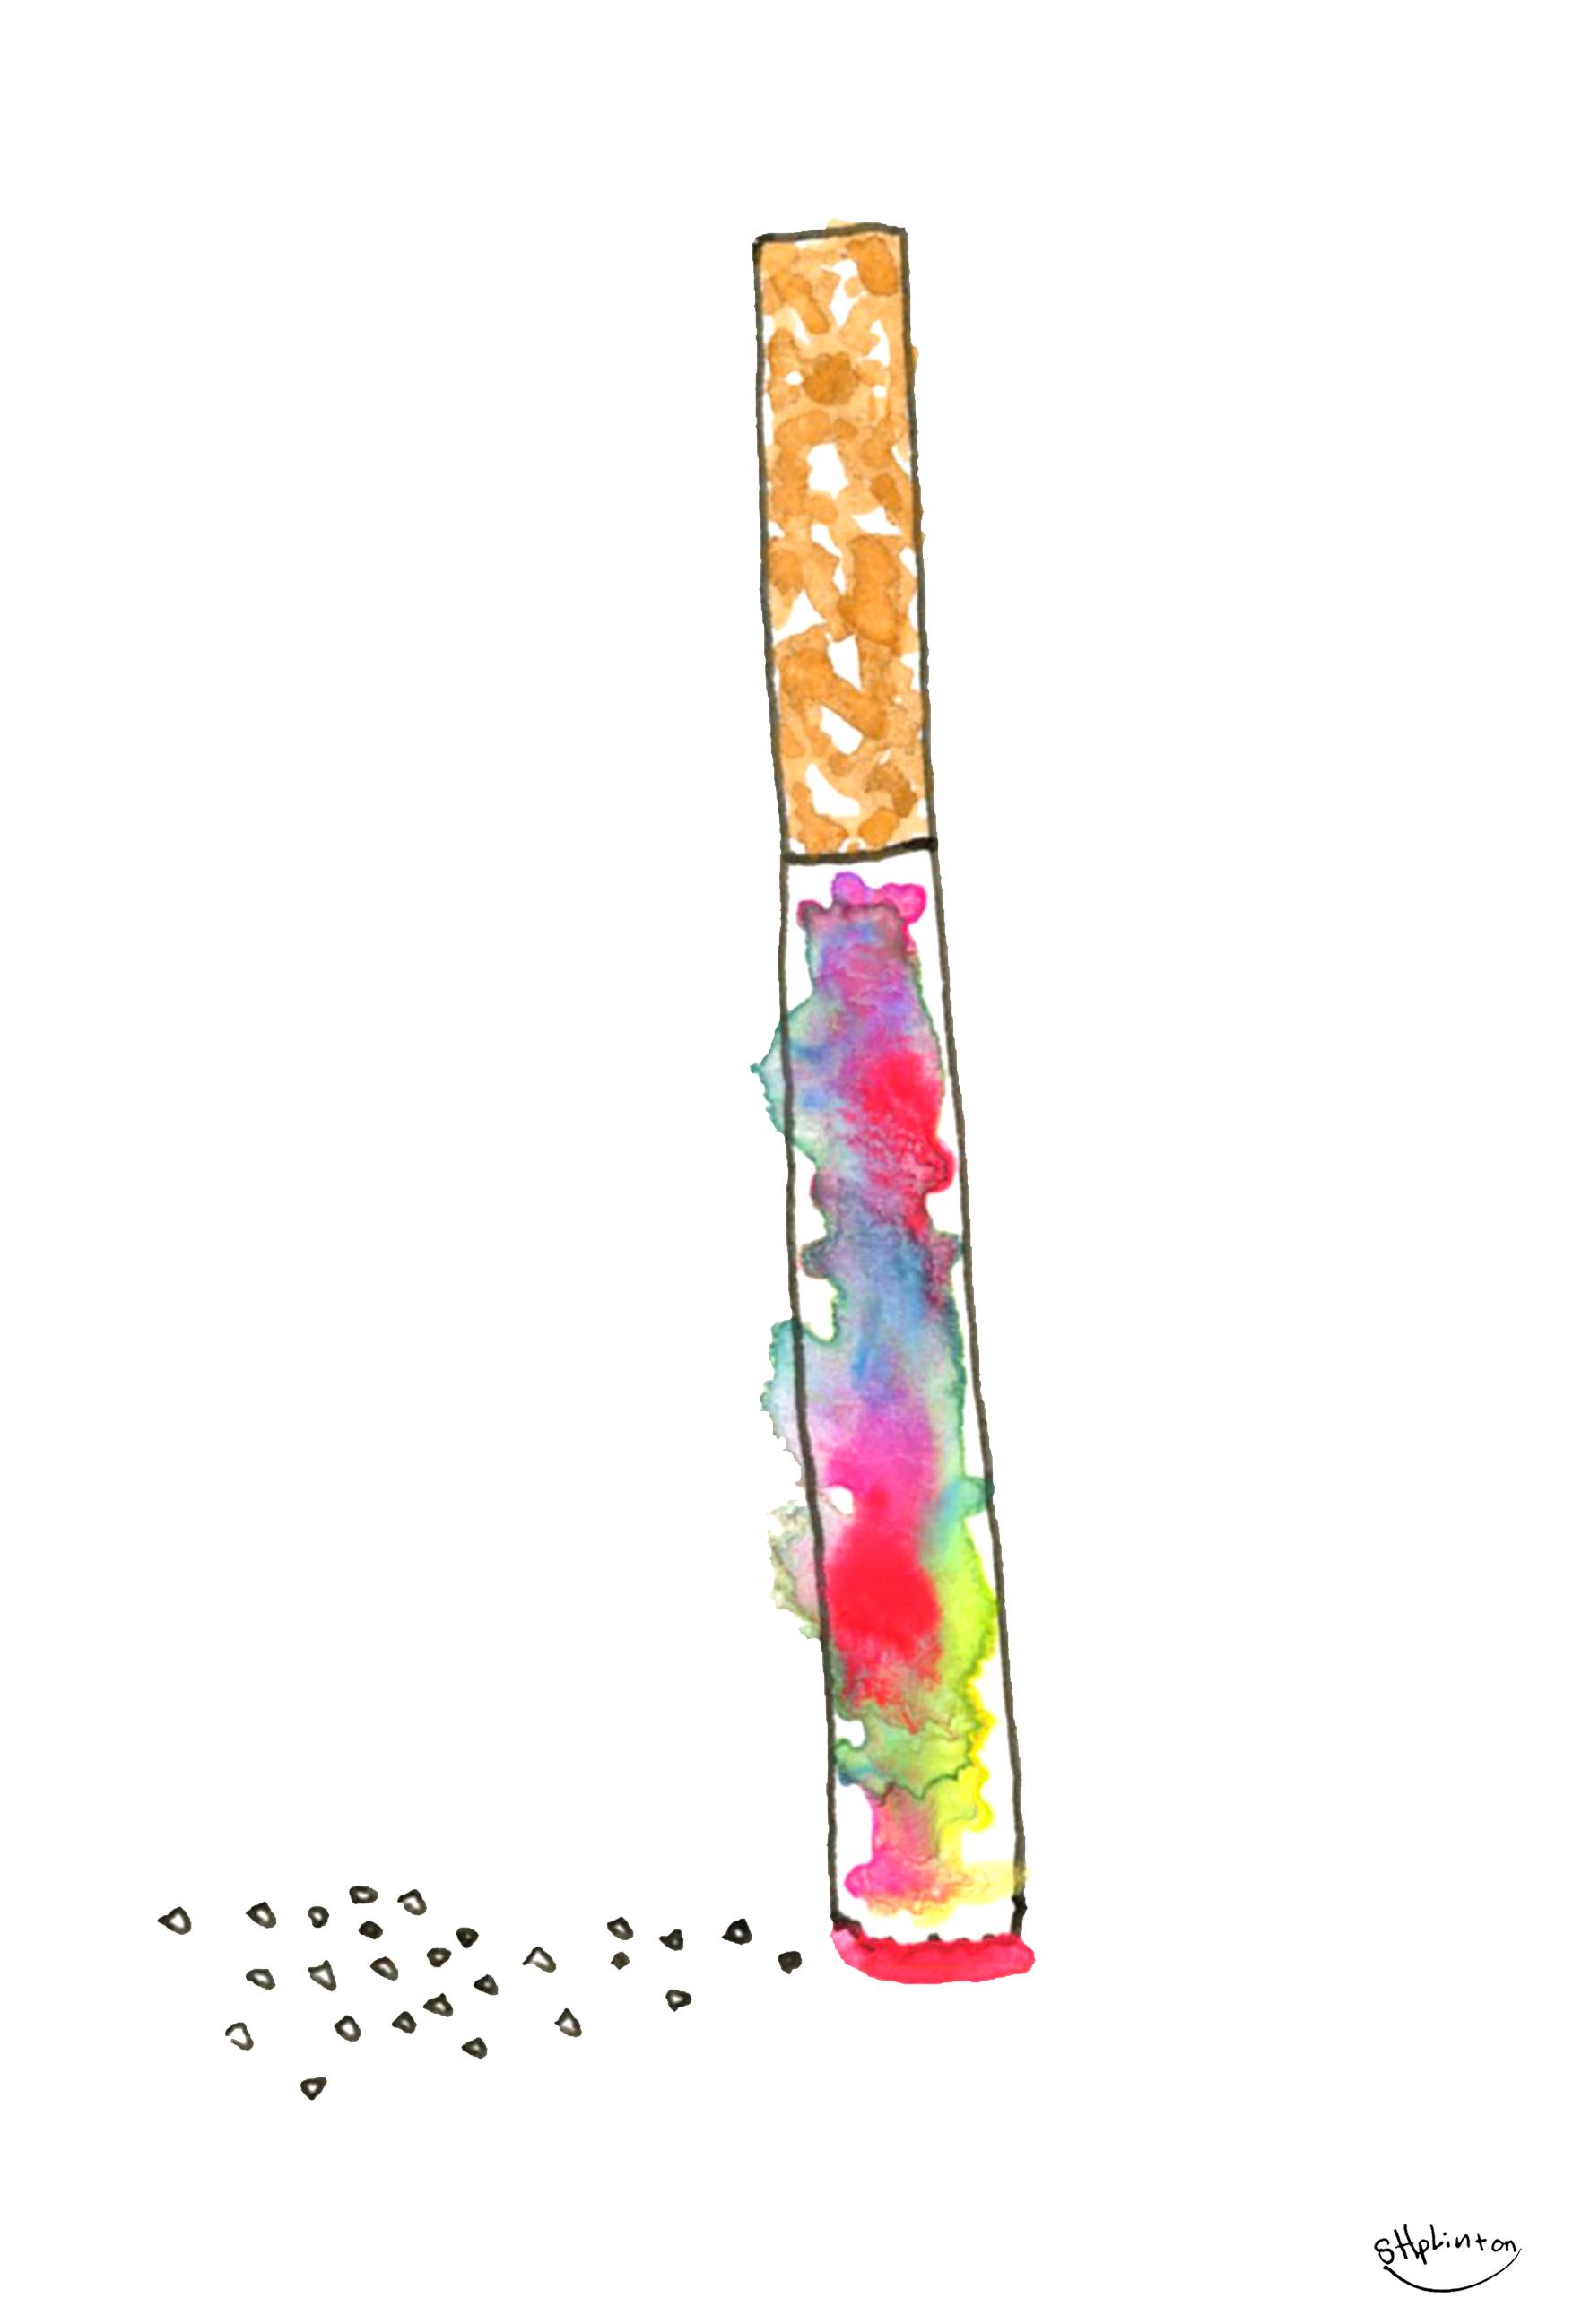 12x18_Print_Colorsmoke (1).jpg